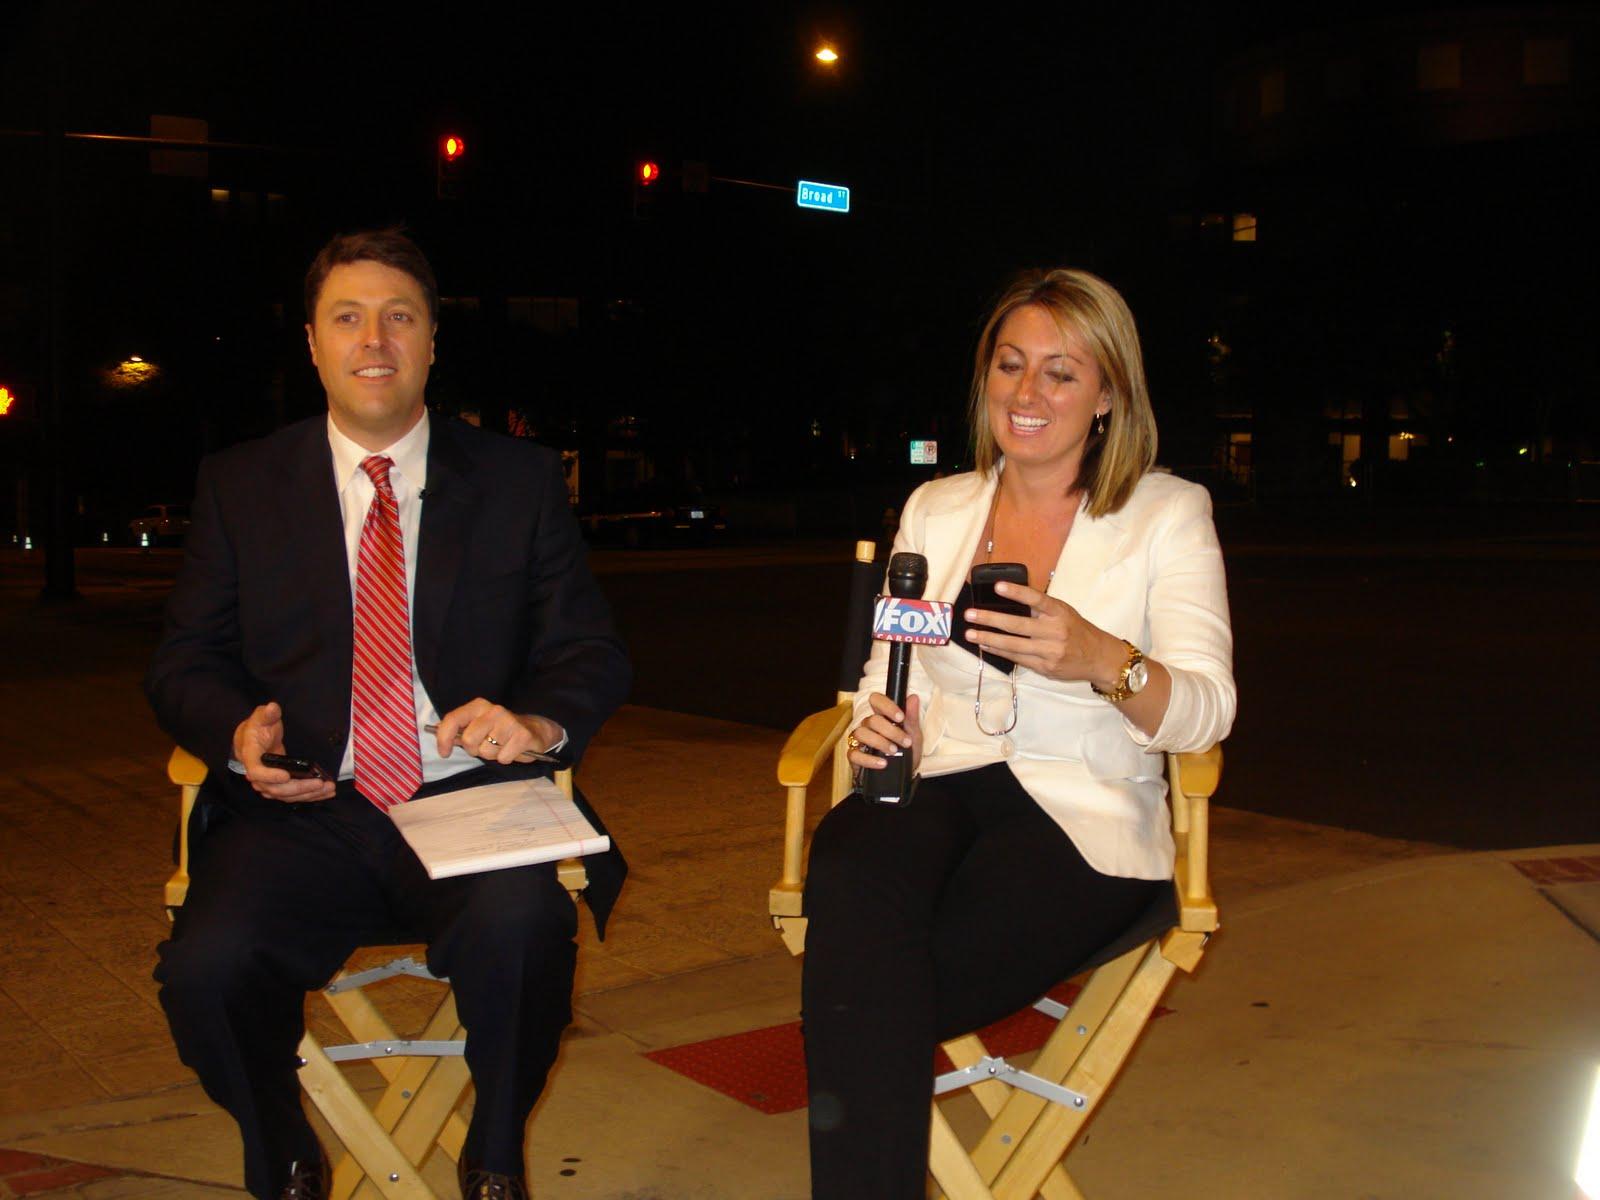 Fox News Republican debate in